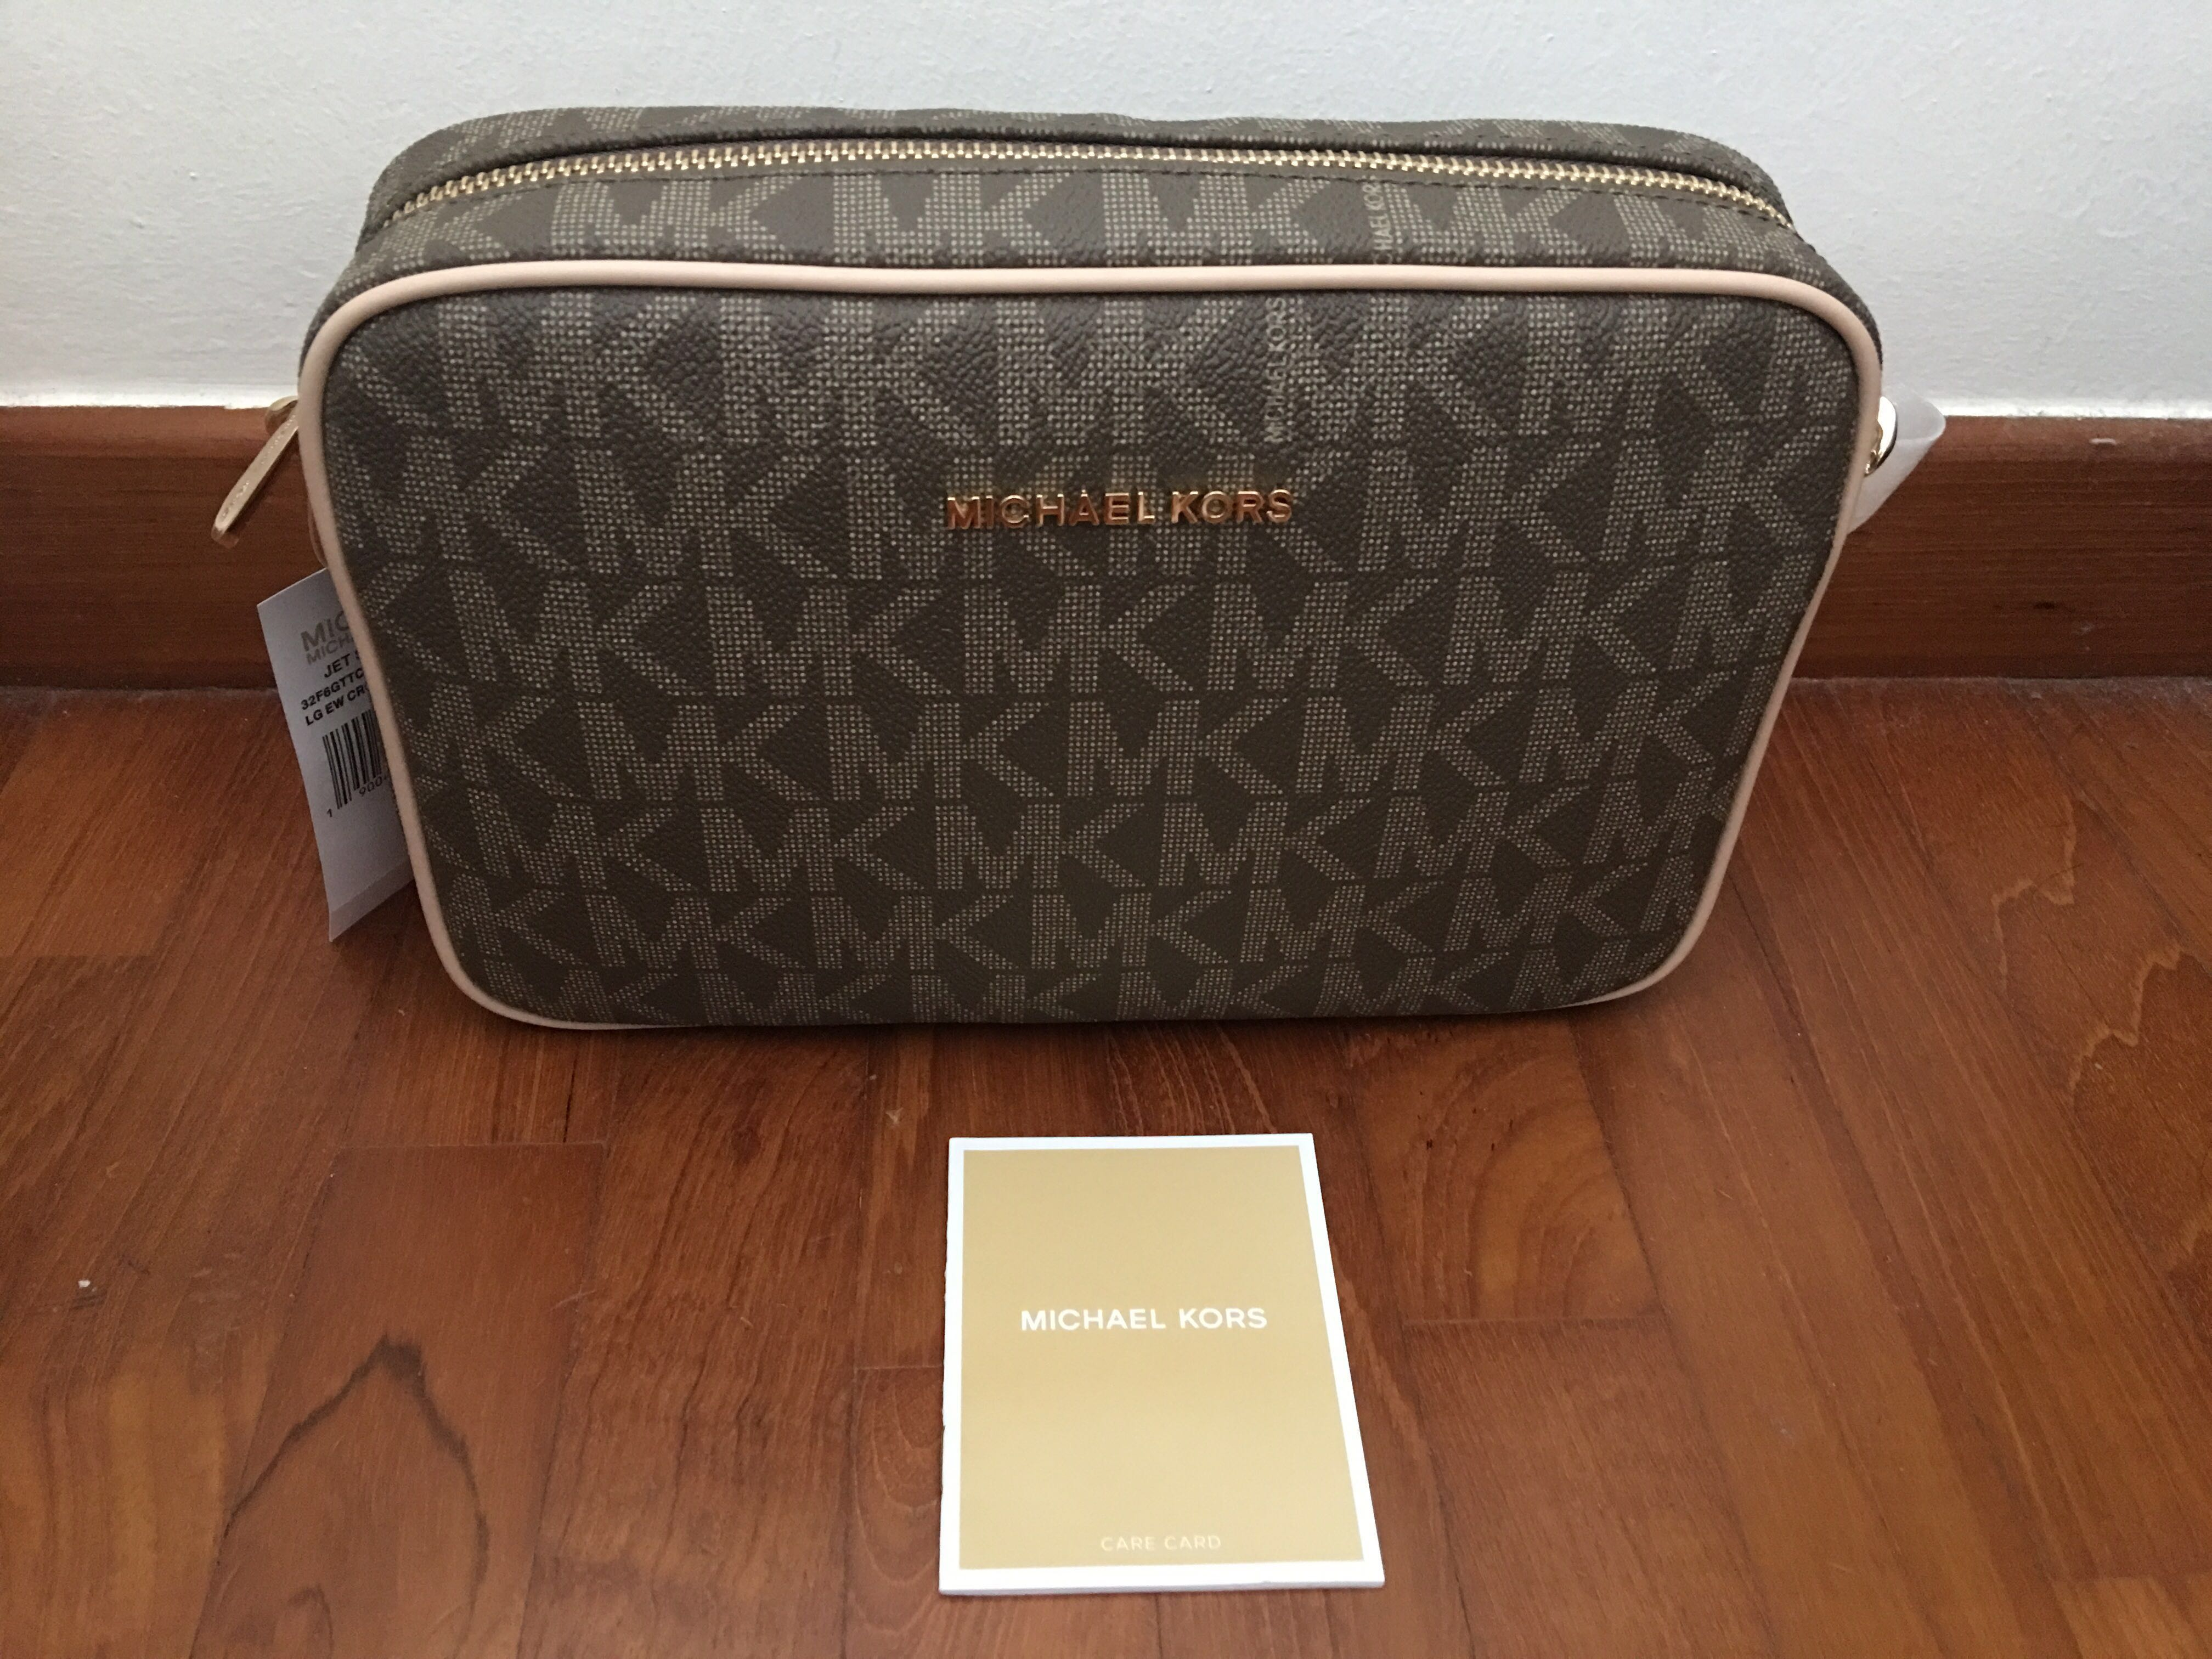 6ebb66b178b1 Michael Kors Jet Set Item Large Crossbody Bag, Luxury, Bags ...